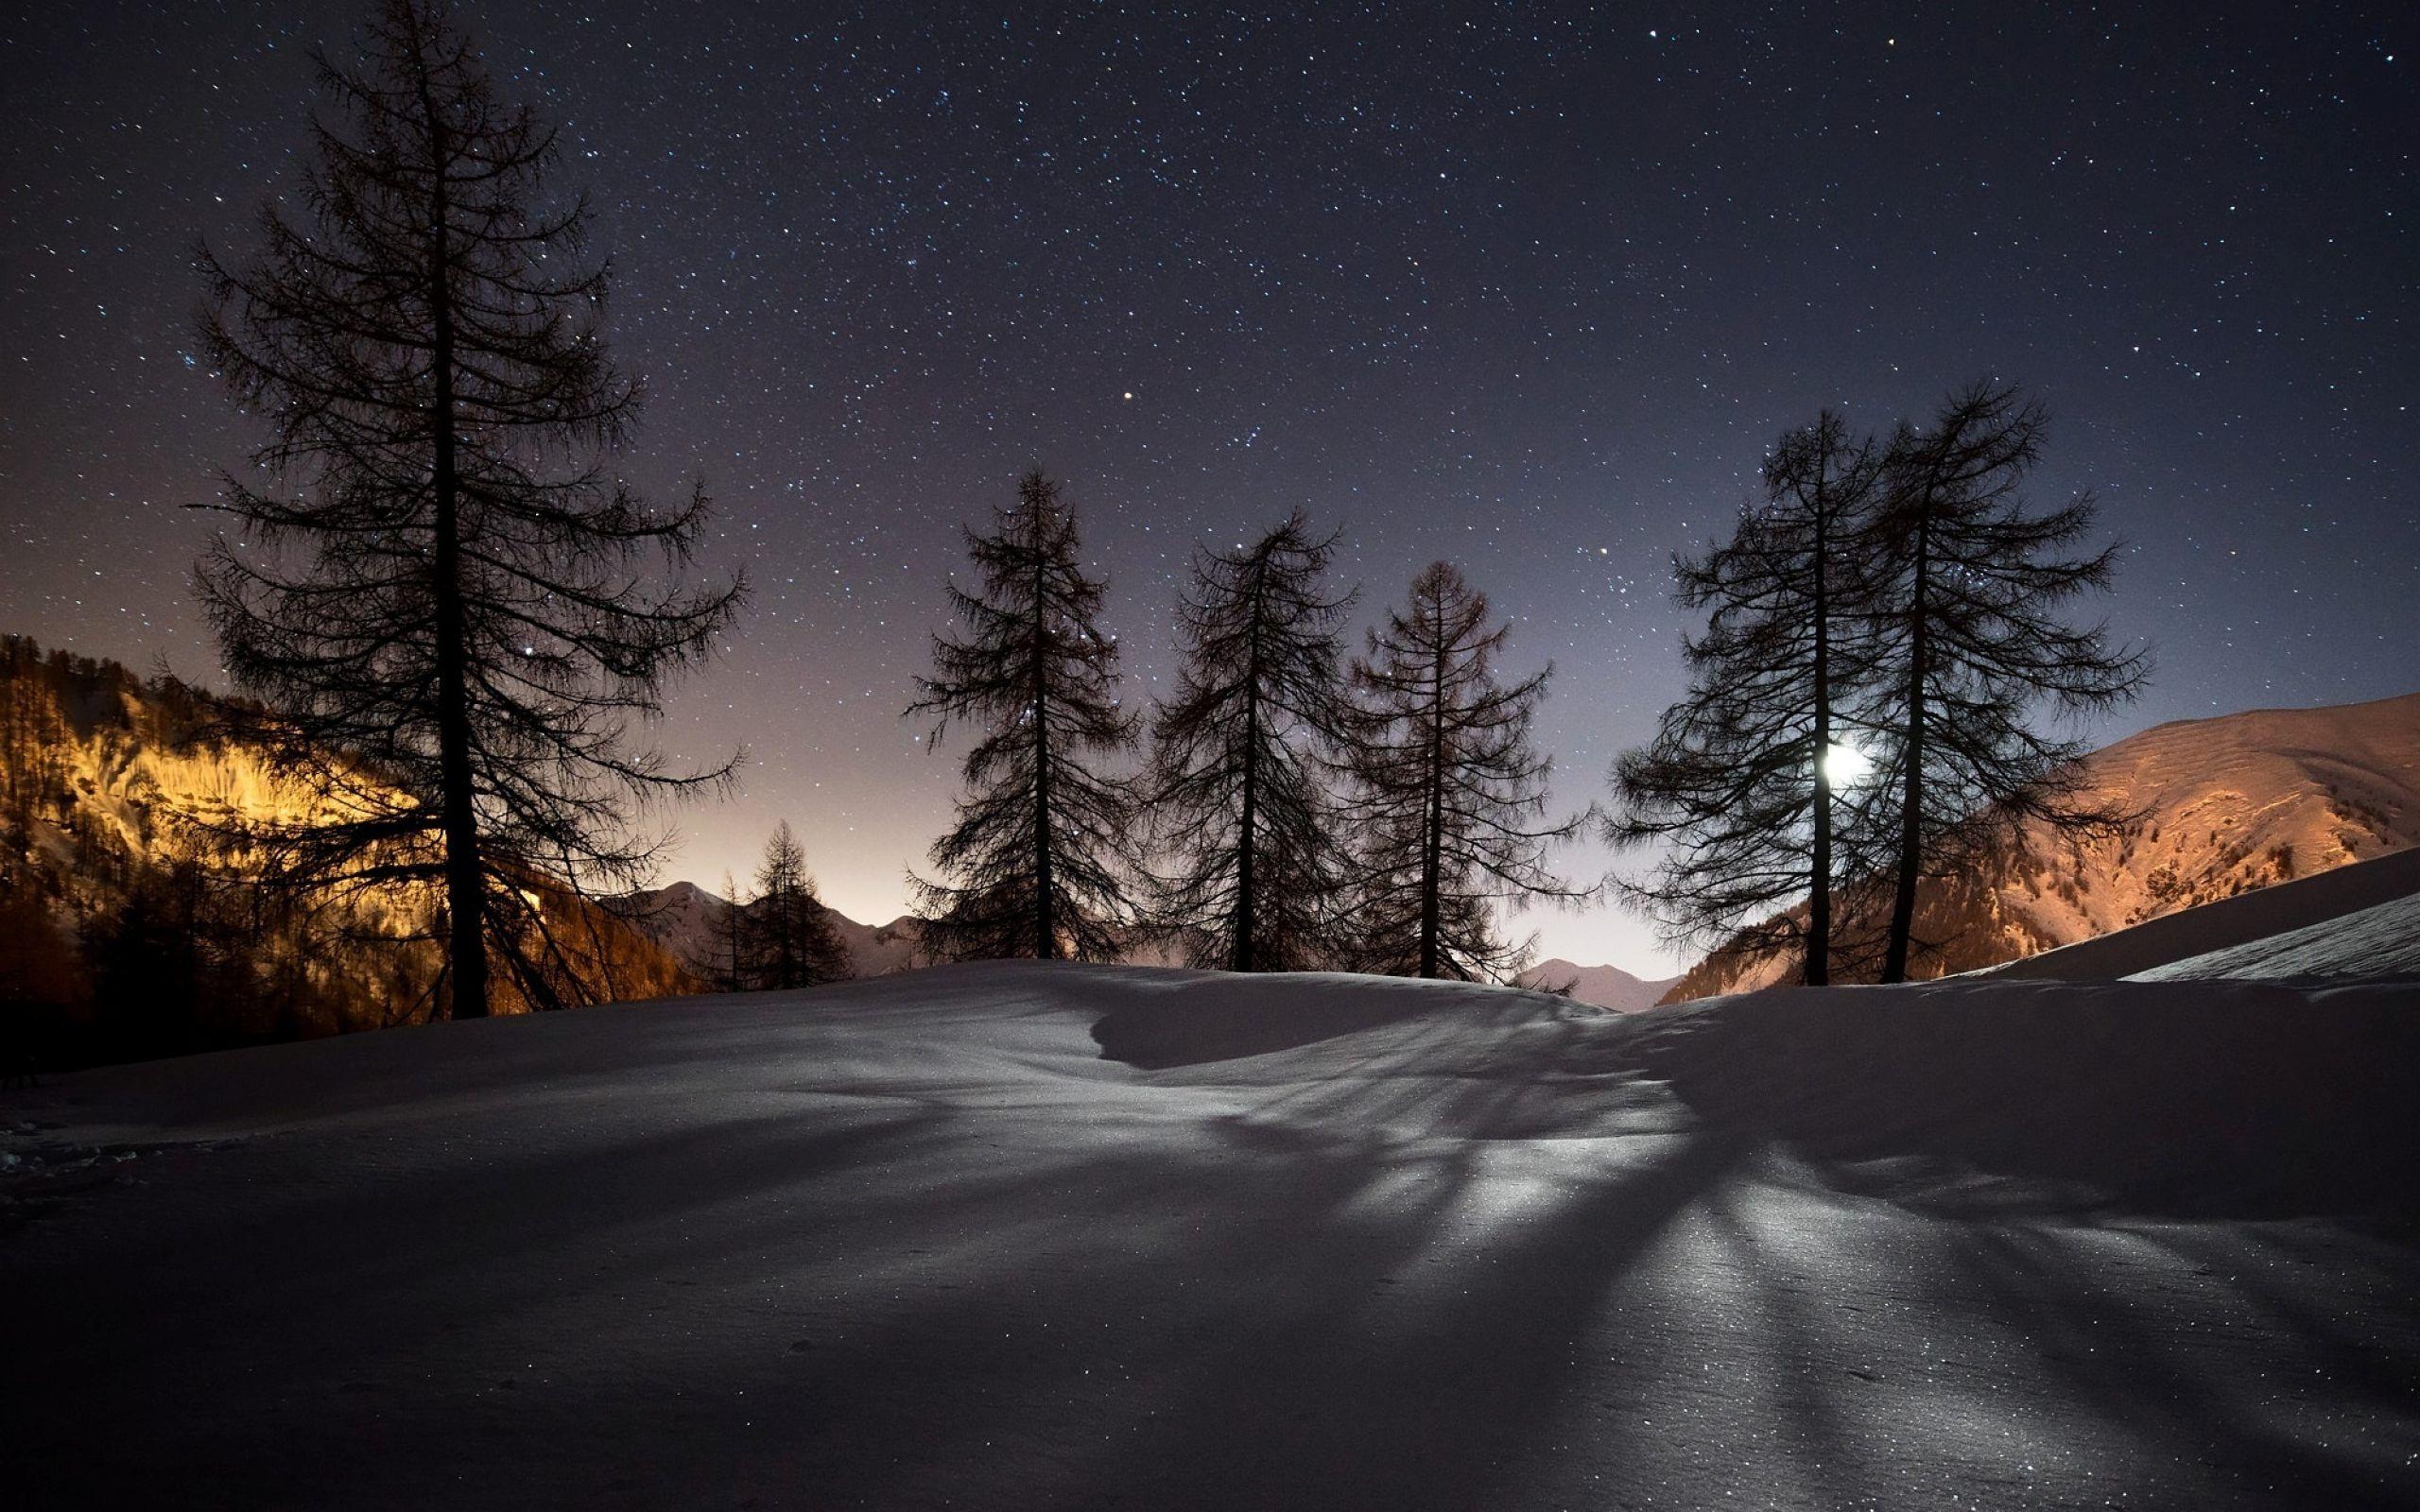 Winter Night Hd Desktop Wallpaper High Definition Fullscreen Night Landscape Winter Wallpaper Hd Winter Wallpaper